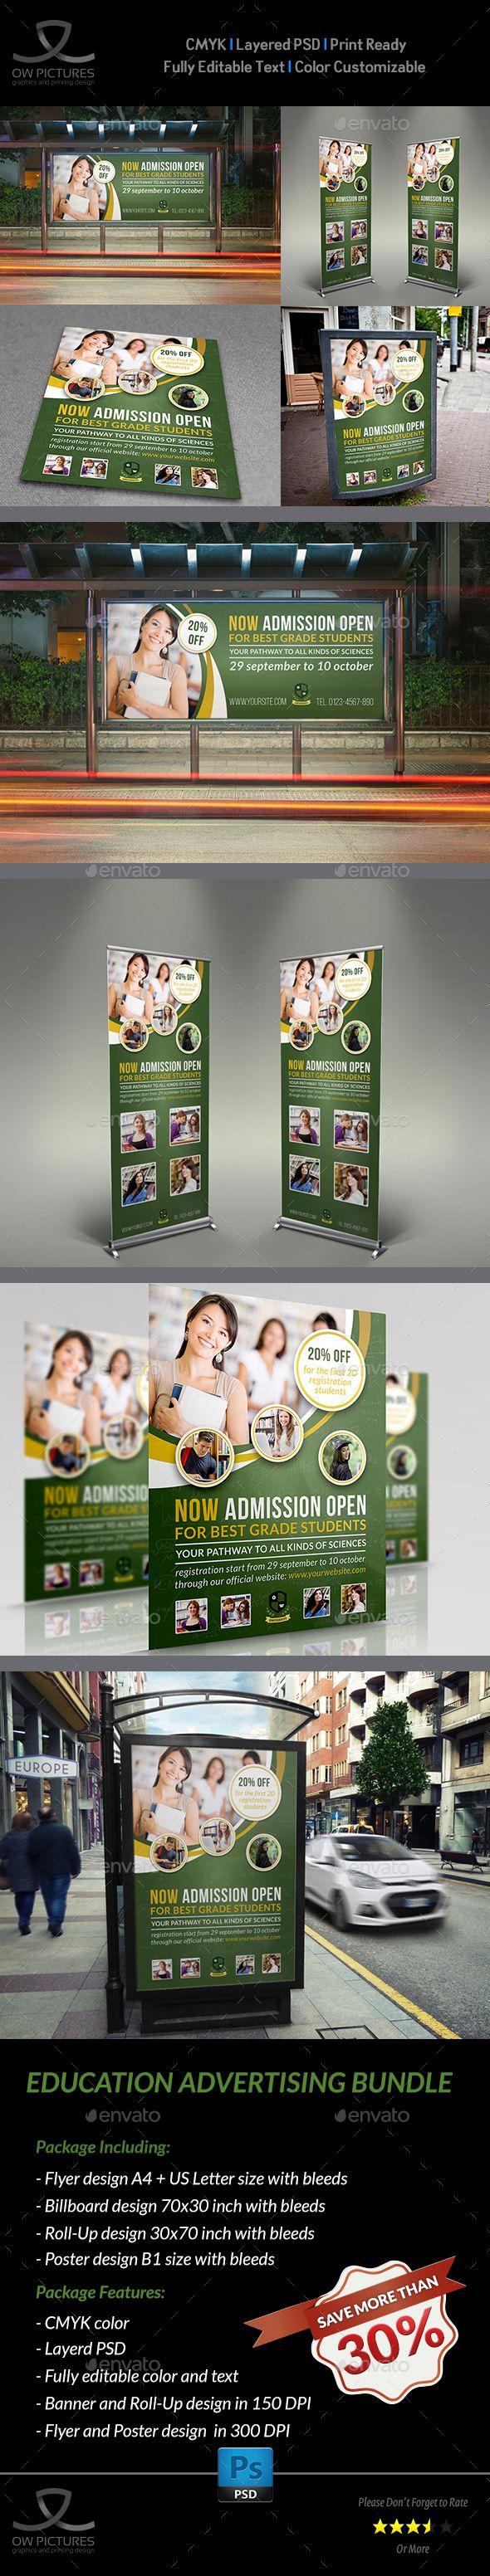 Education Advertising Bundle by OWPictures Advertising Package Description : Edu...